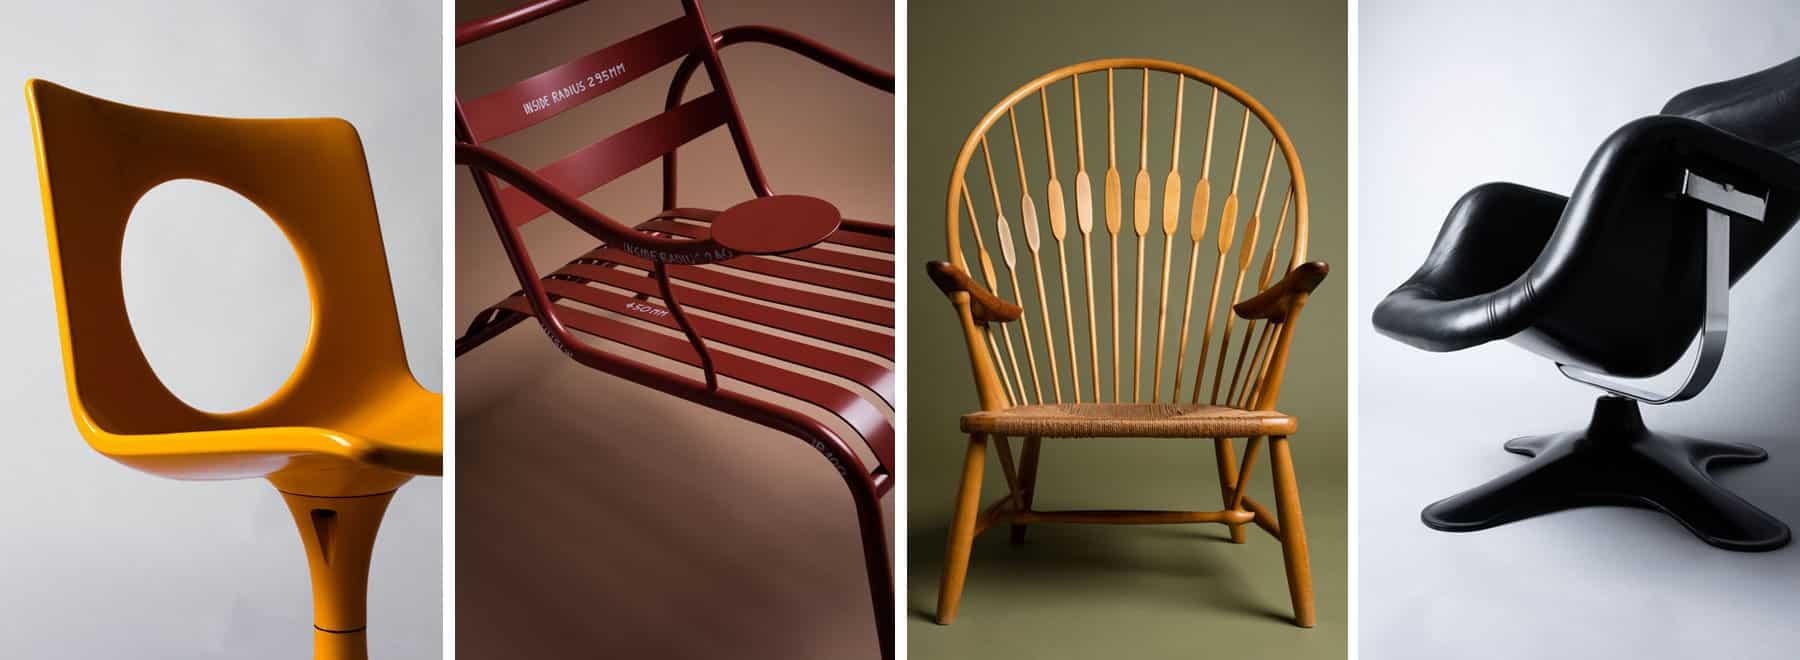 Carl Gustaf Hiort af Ornäs's Afo-Seat, 1971; Jasper Morrison's Thinking Mans chair, 1987; Hans Wegner's Peacock chair, 1947; and Yrjö Kukkapuro's Karuselli chair, 1964